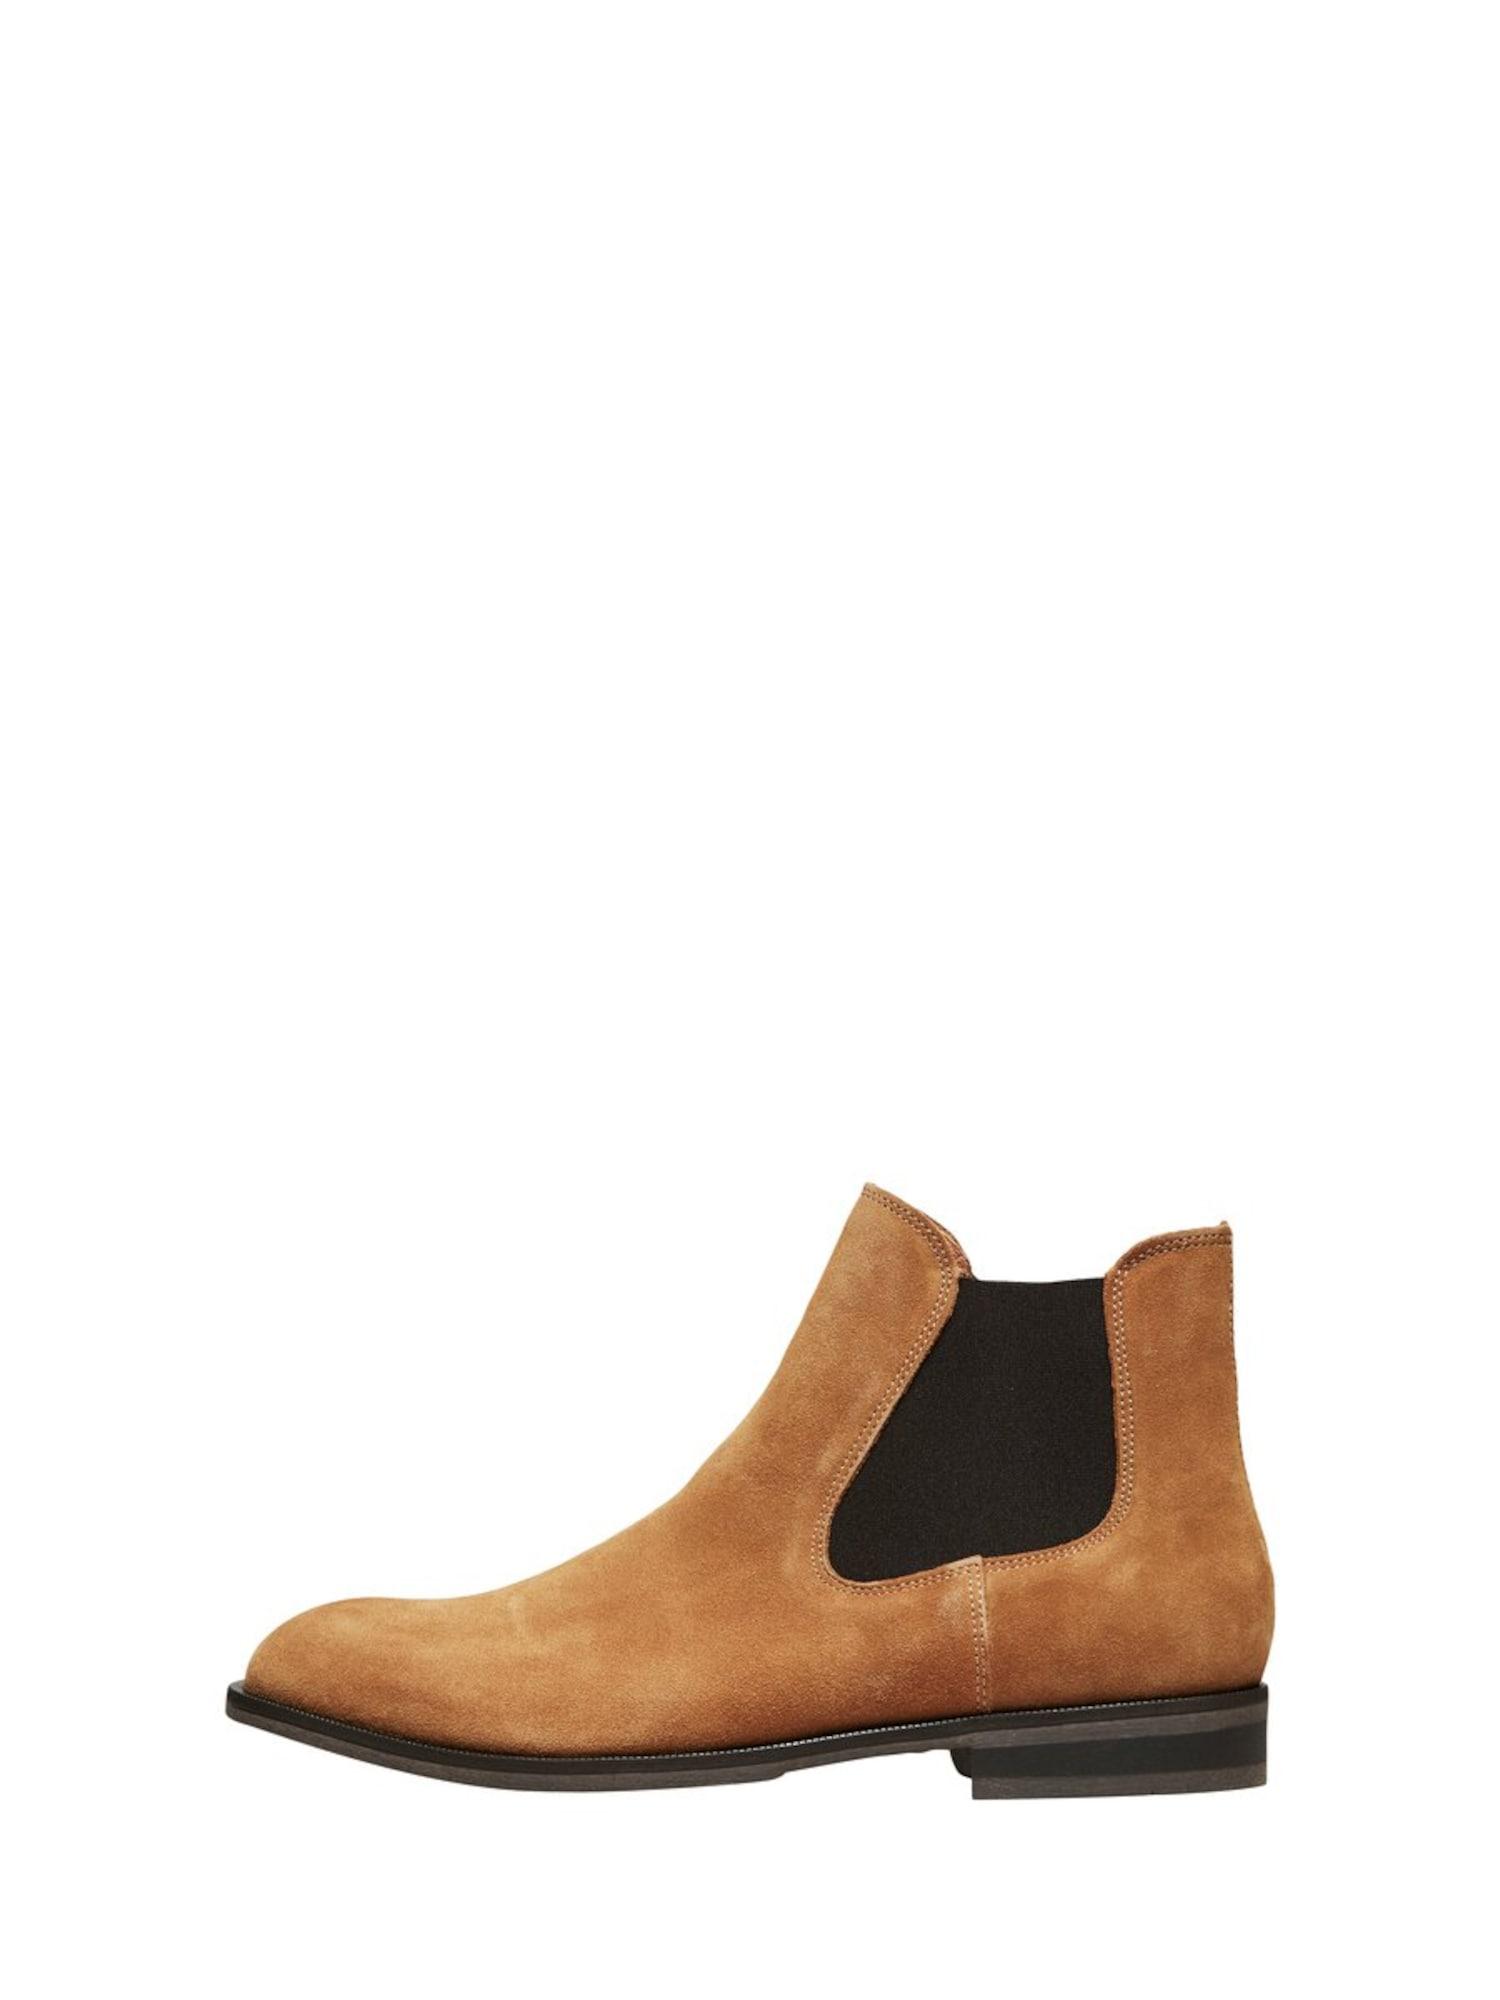 SELECTED HOMME Chelsea batai juoda / ruda (konjako)